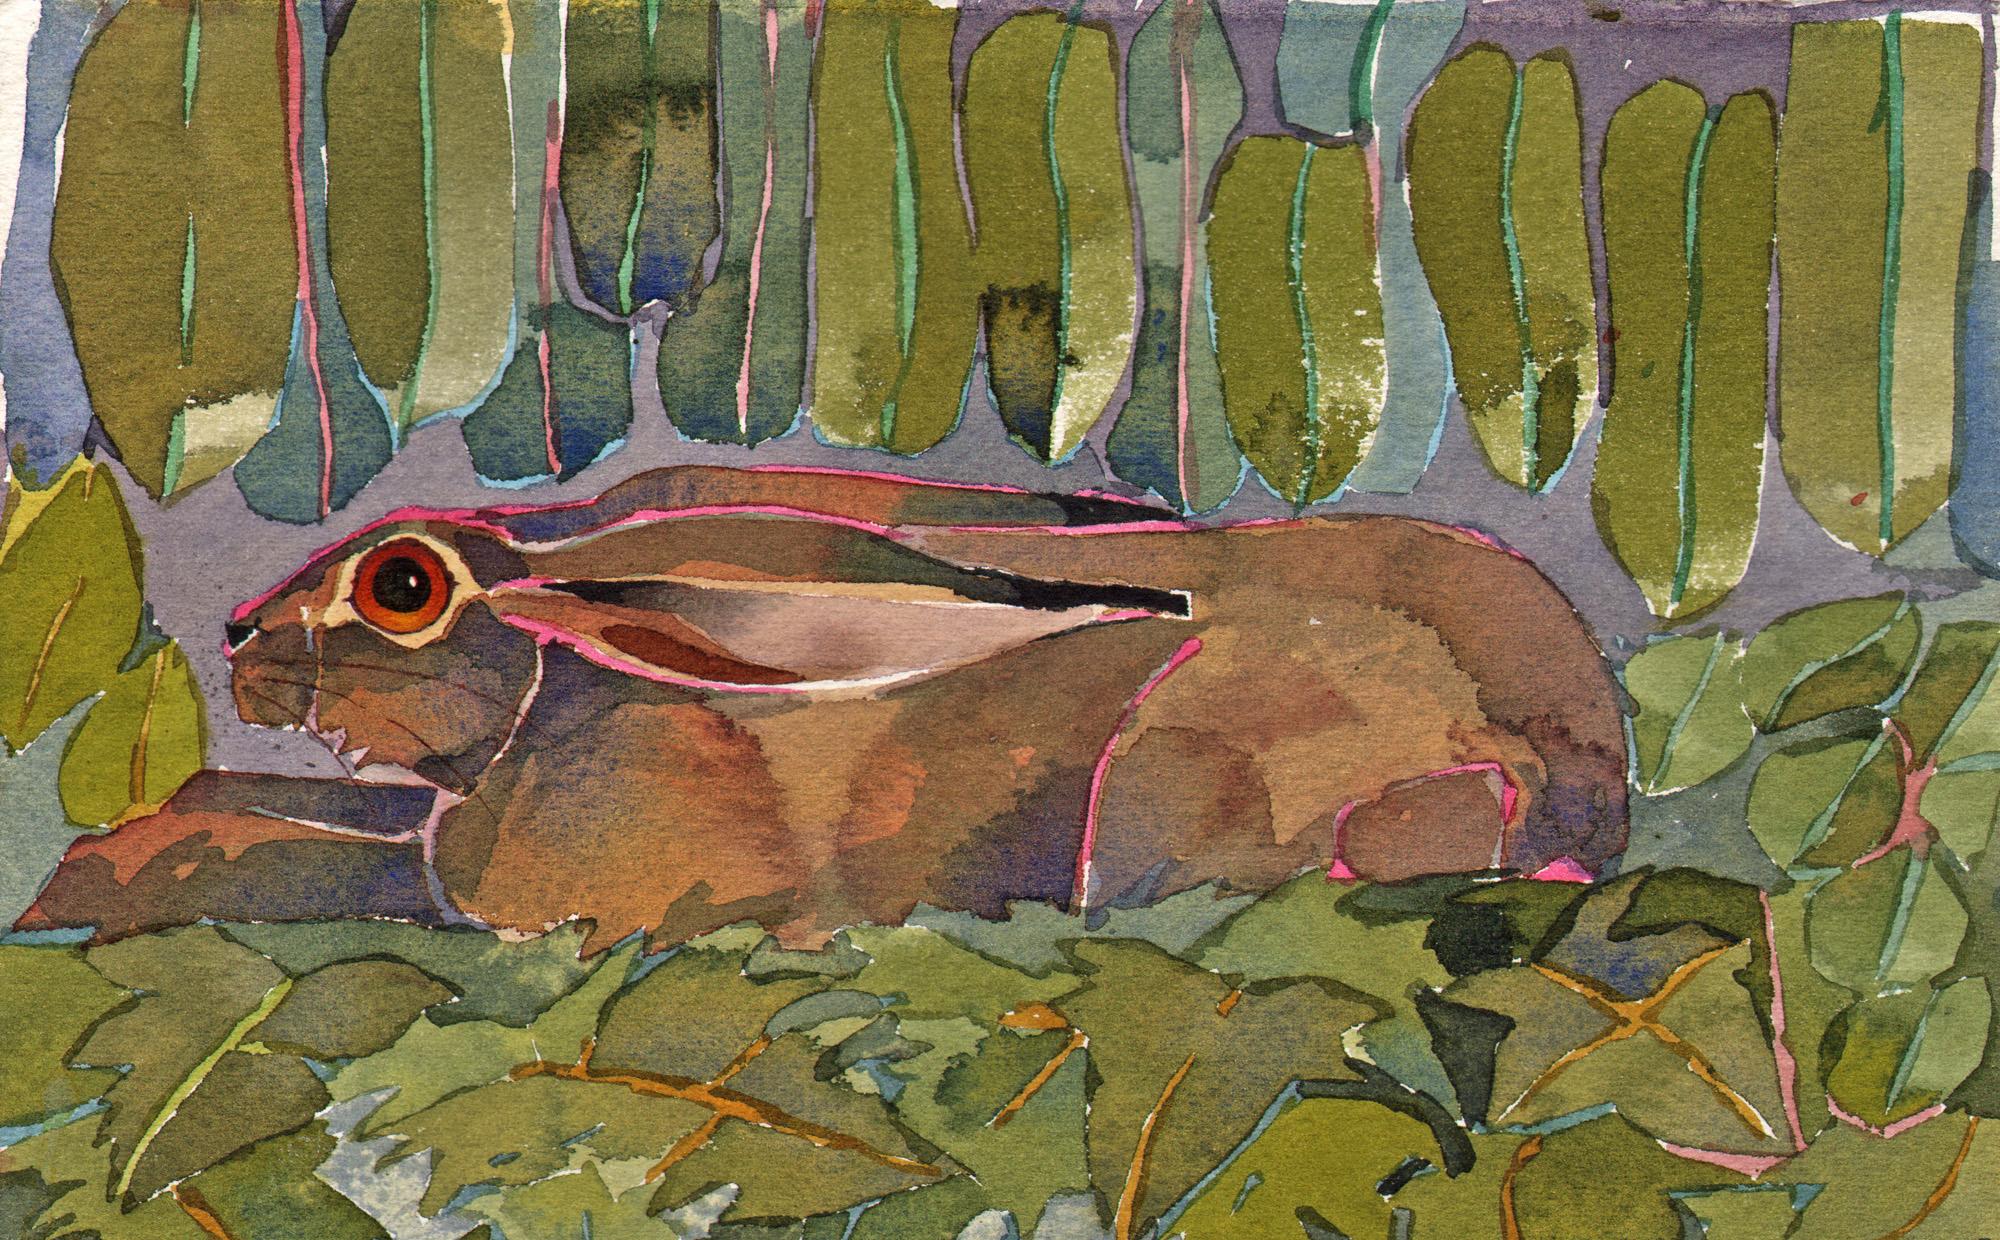 Hare, lying image